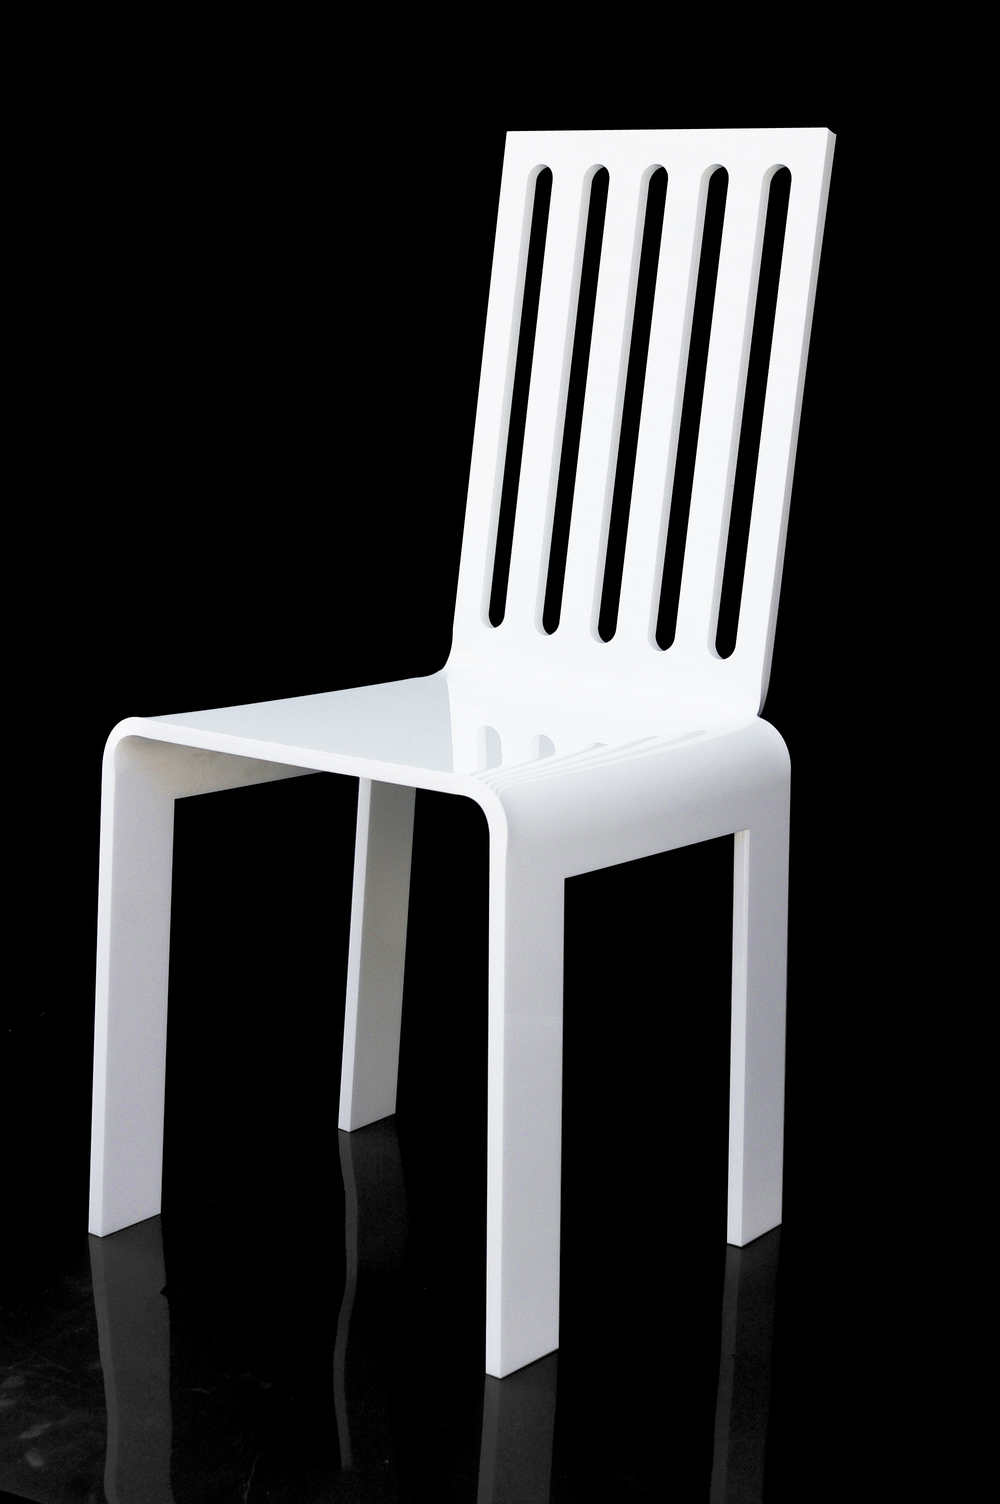 Chaise barreau blanche Fond noir.jpg